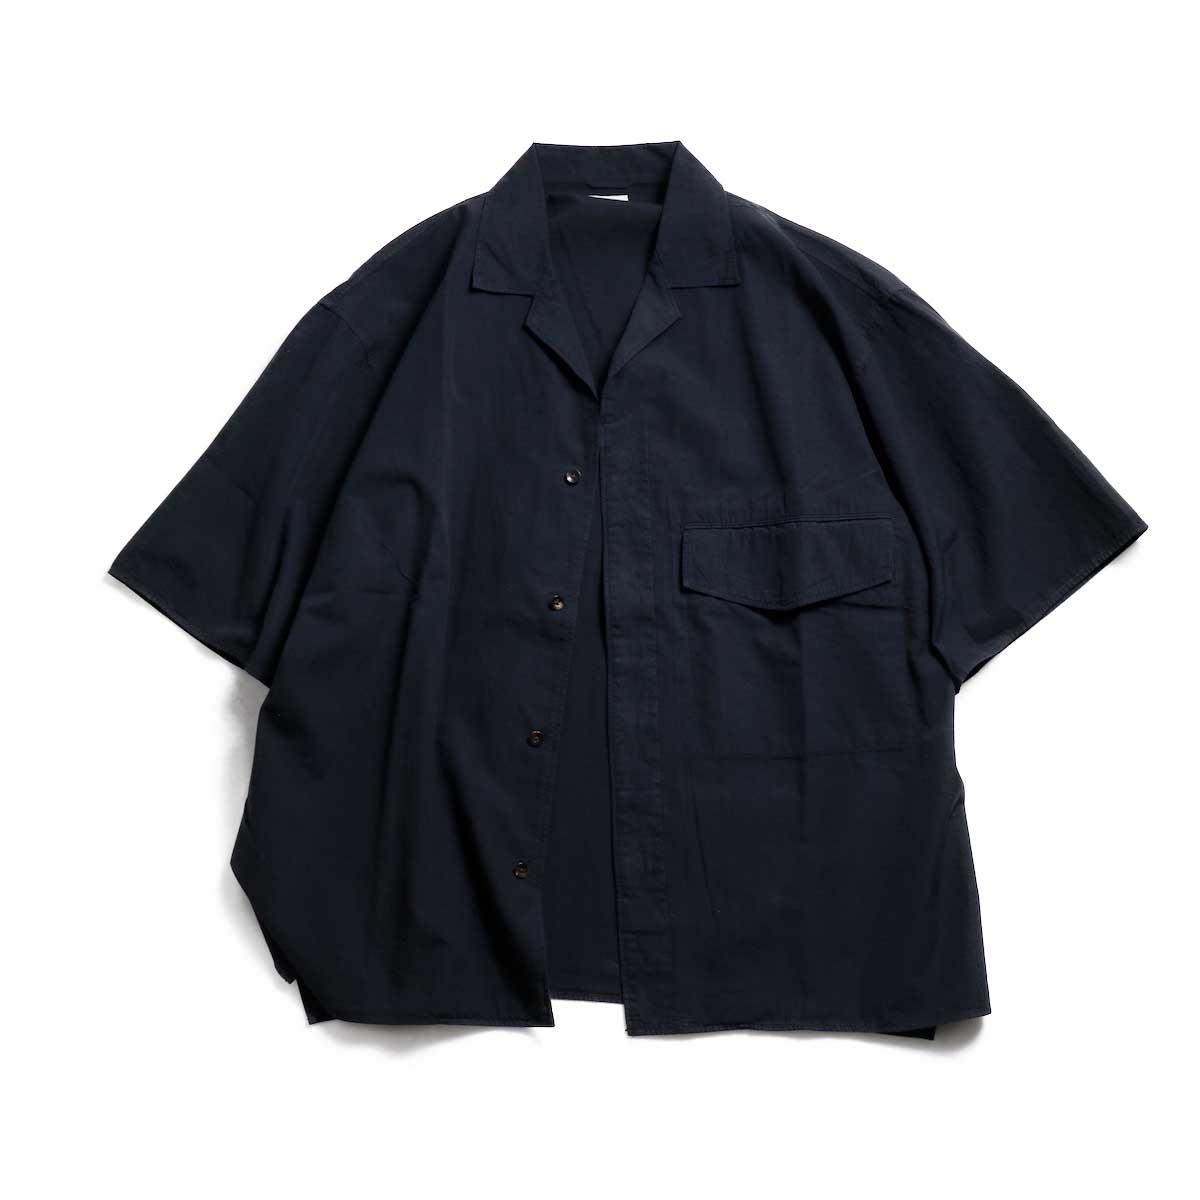 blurhms / Polish Chambray Wide Sleeve Box Shirt -Navy ボタンオープン